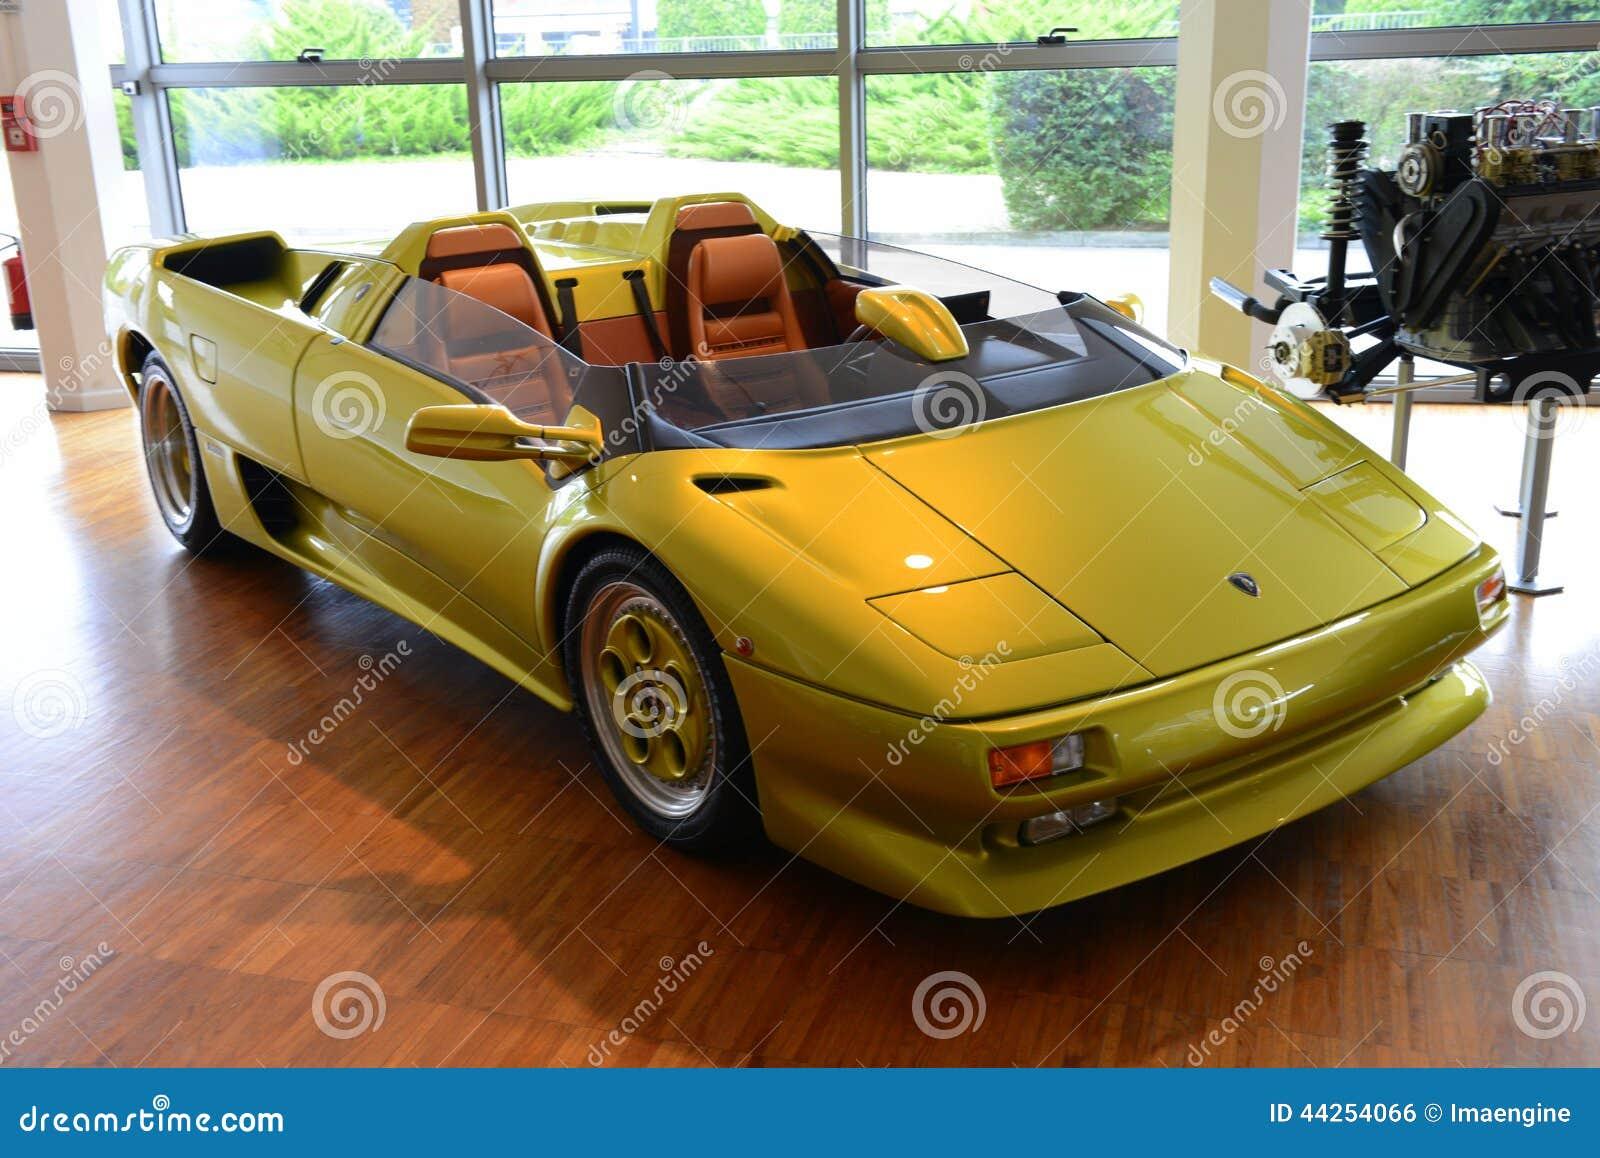 Lamborghini Diablo Spyder Editorial Photo Image Of Expensive 44254066